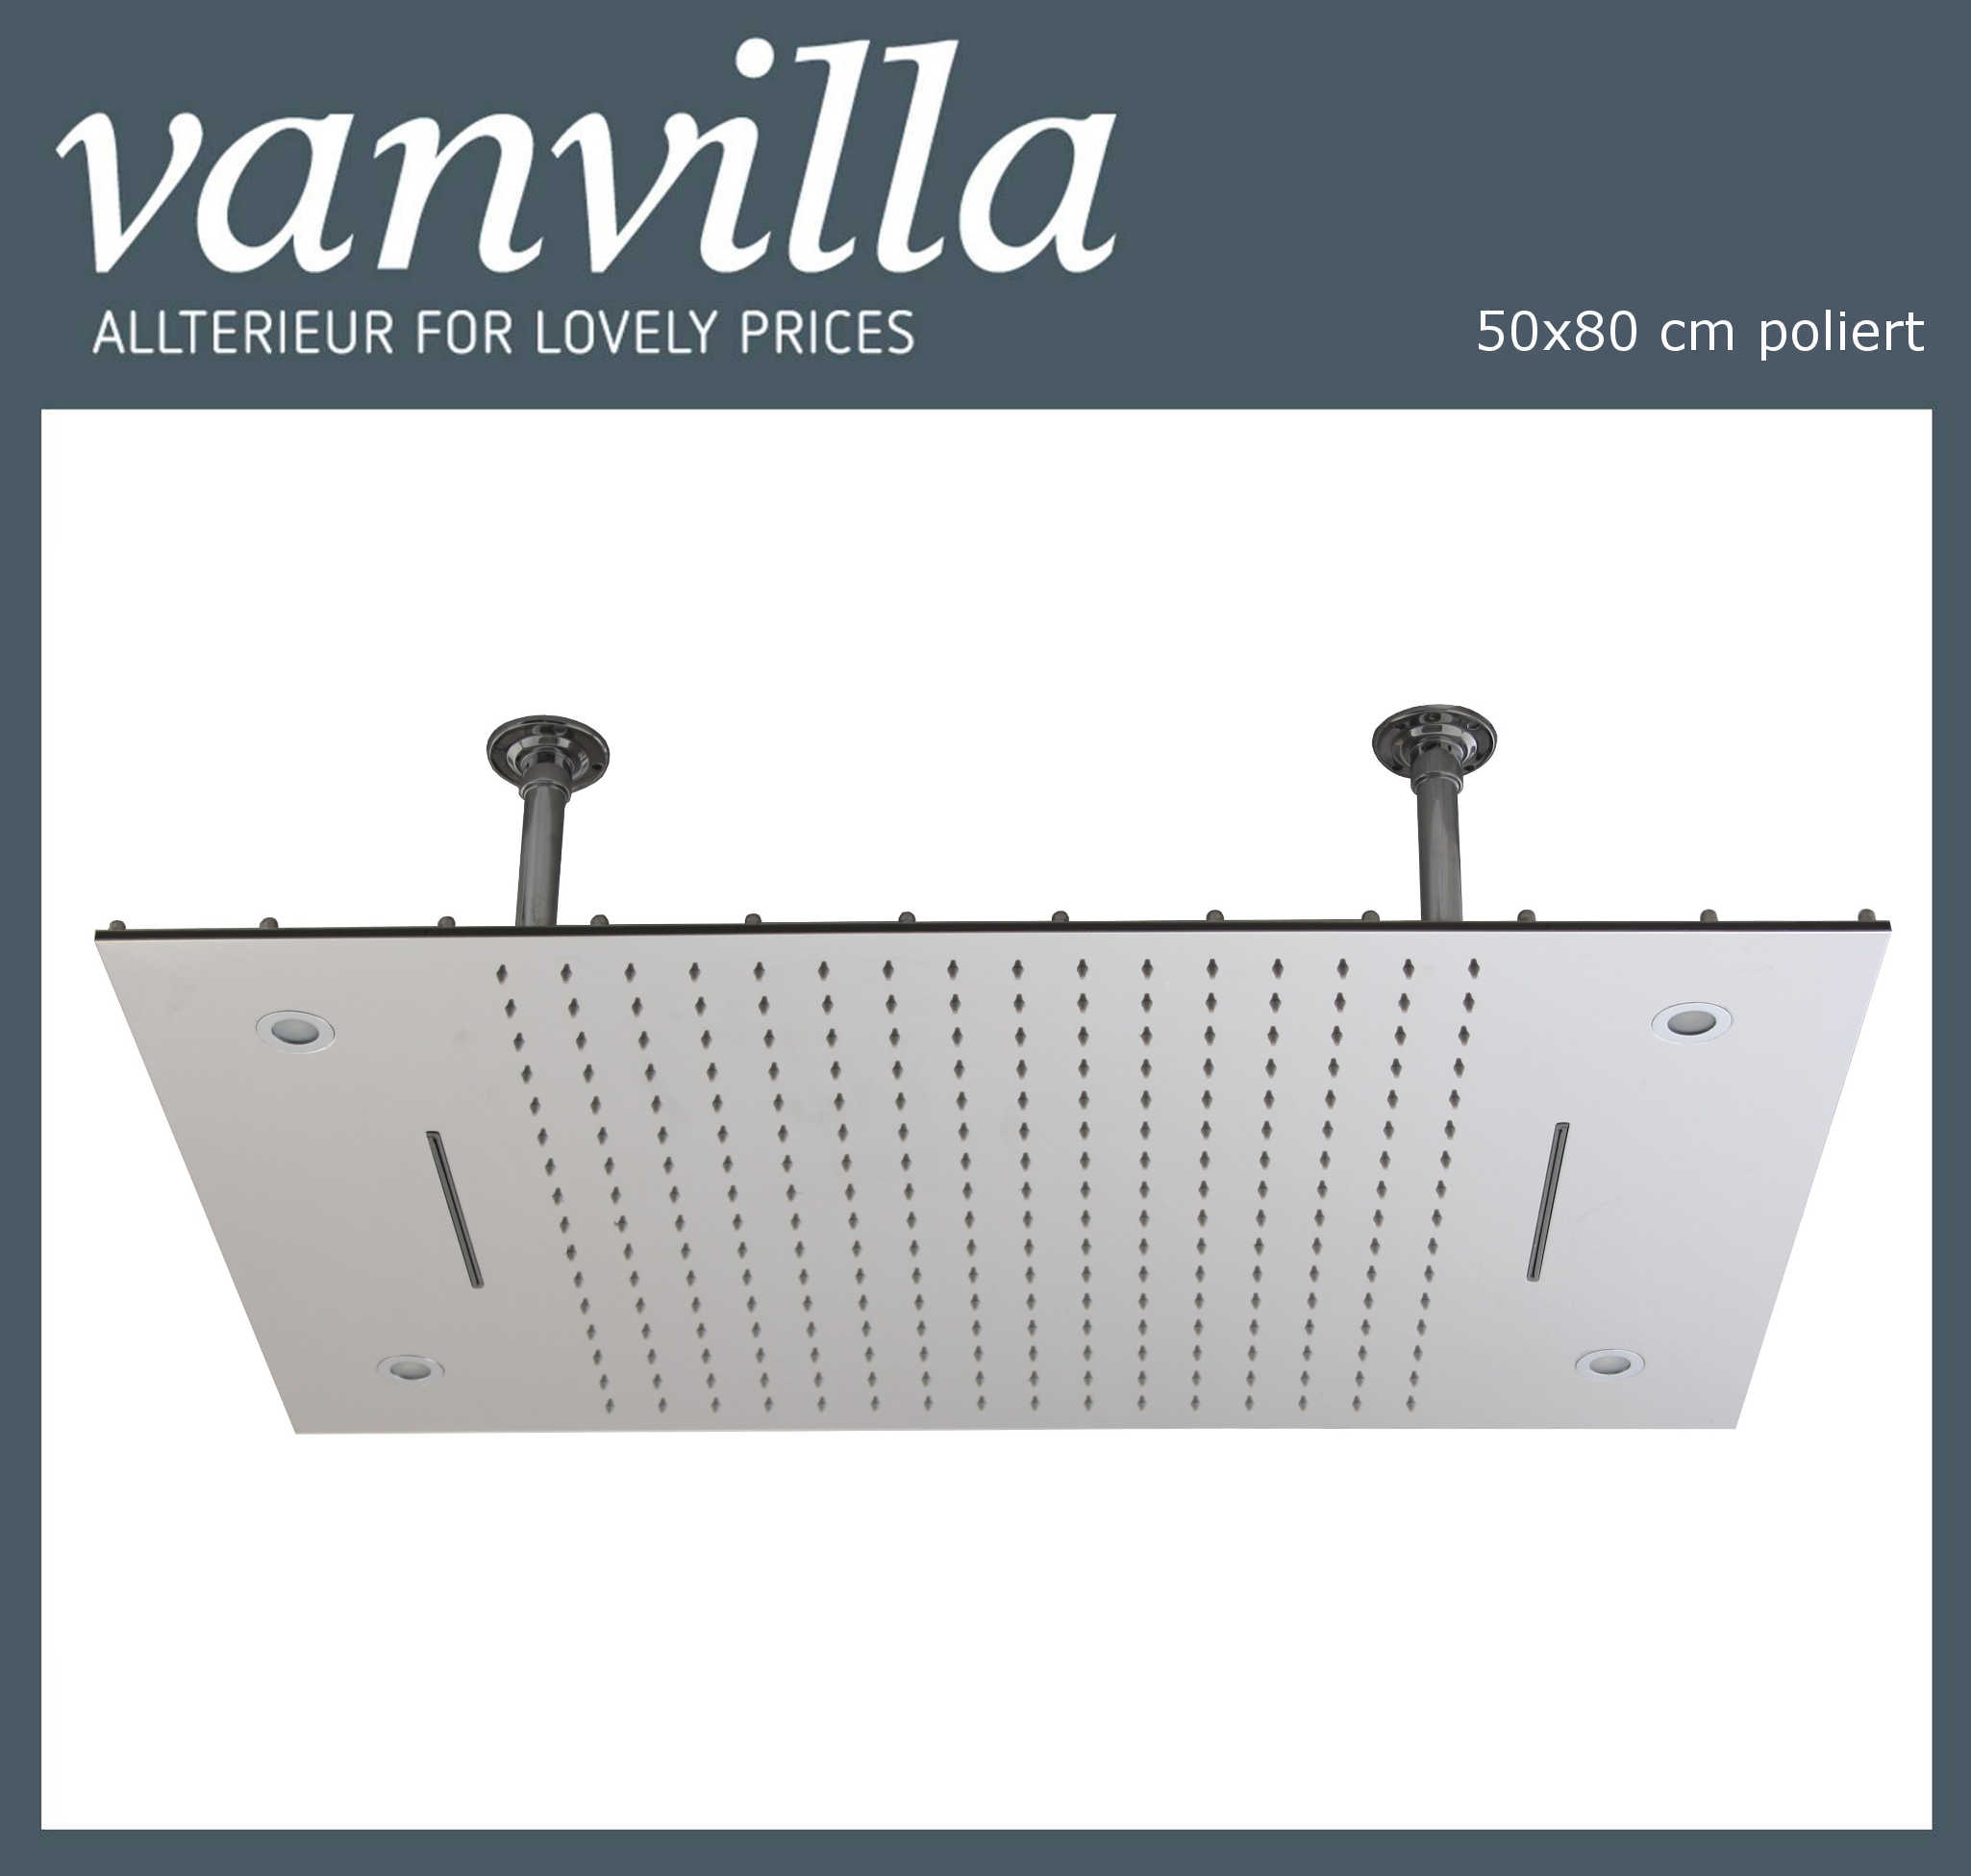 Duschkopf vanvilla LED 50cm x 80cm poliert 115080W-P LED